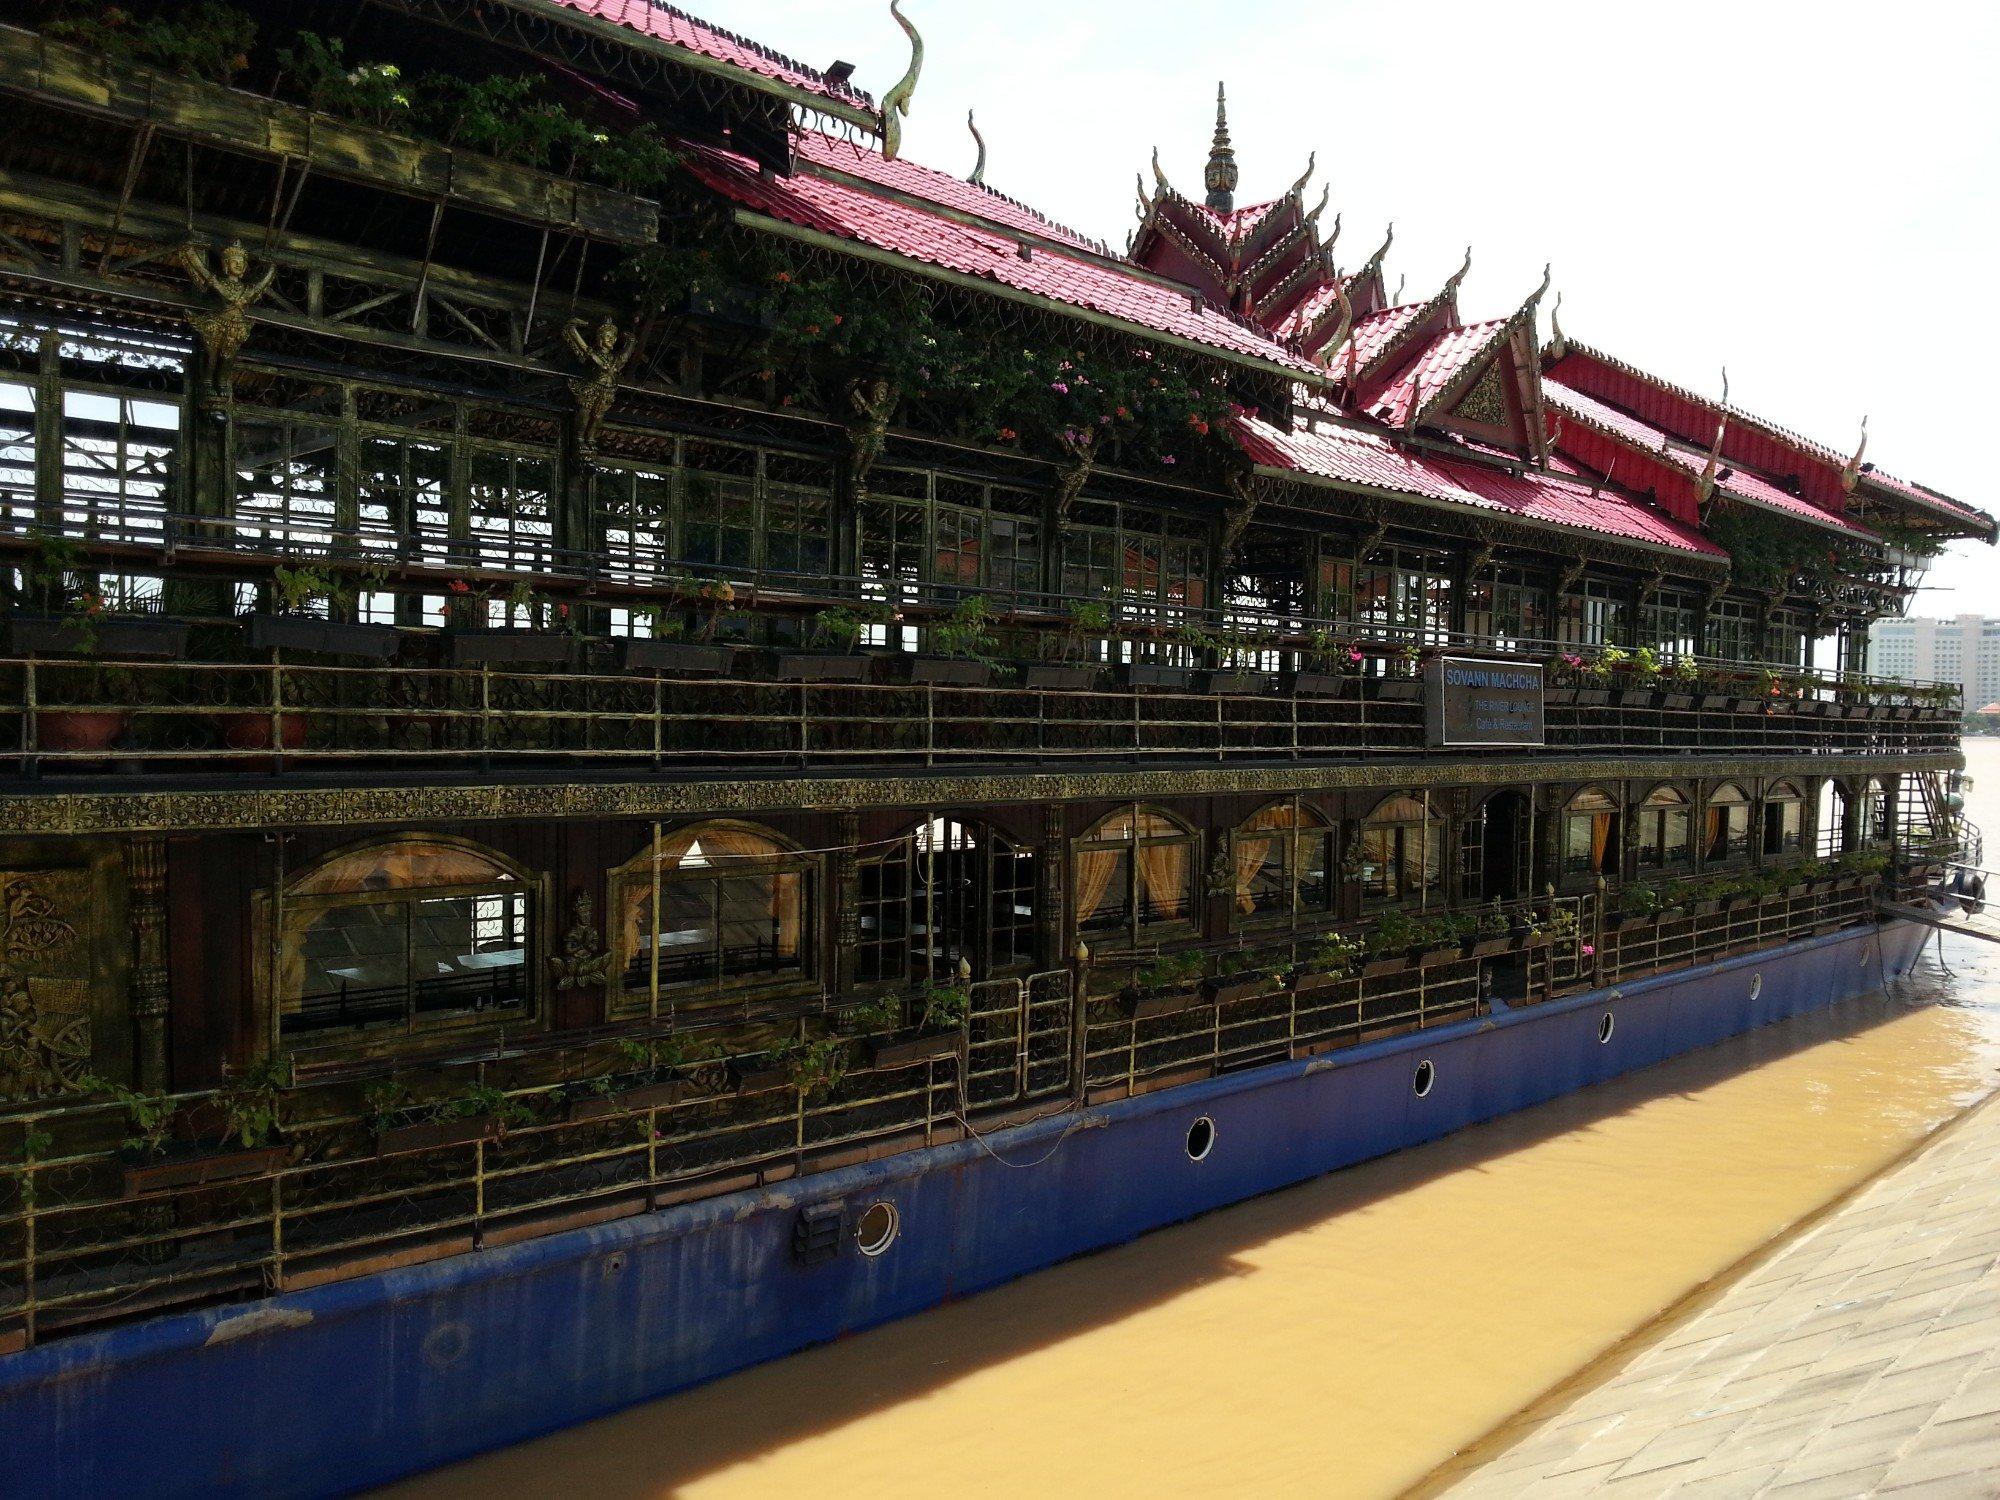 Restaurant cruiser in Phnom Penh